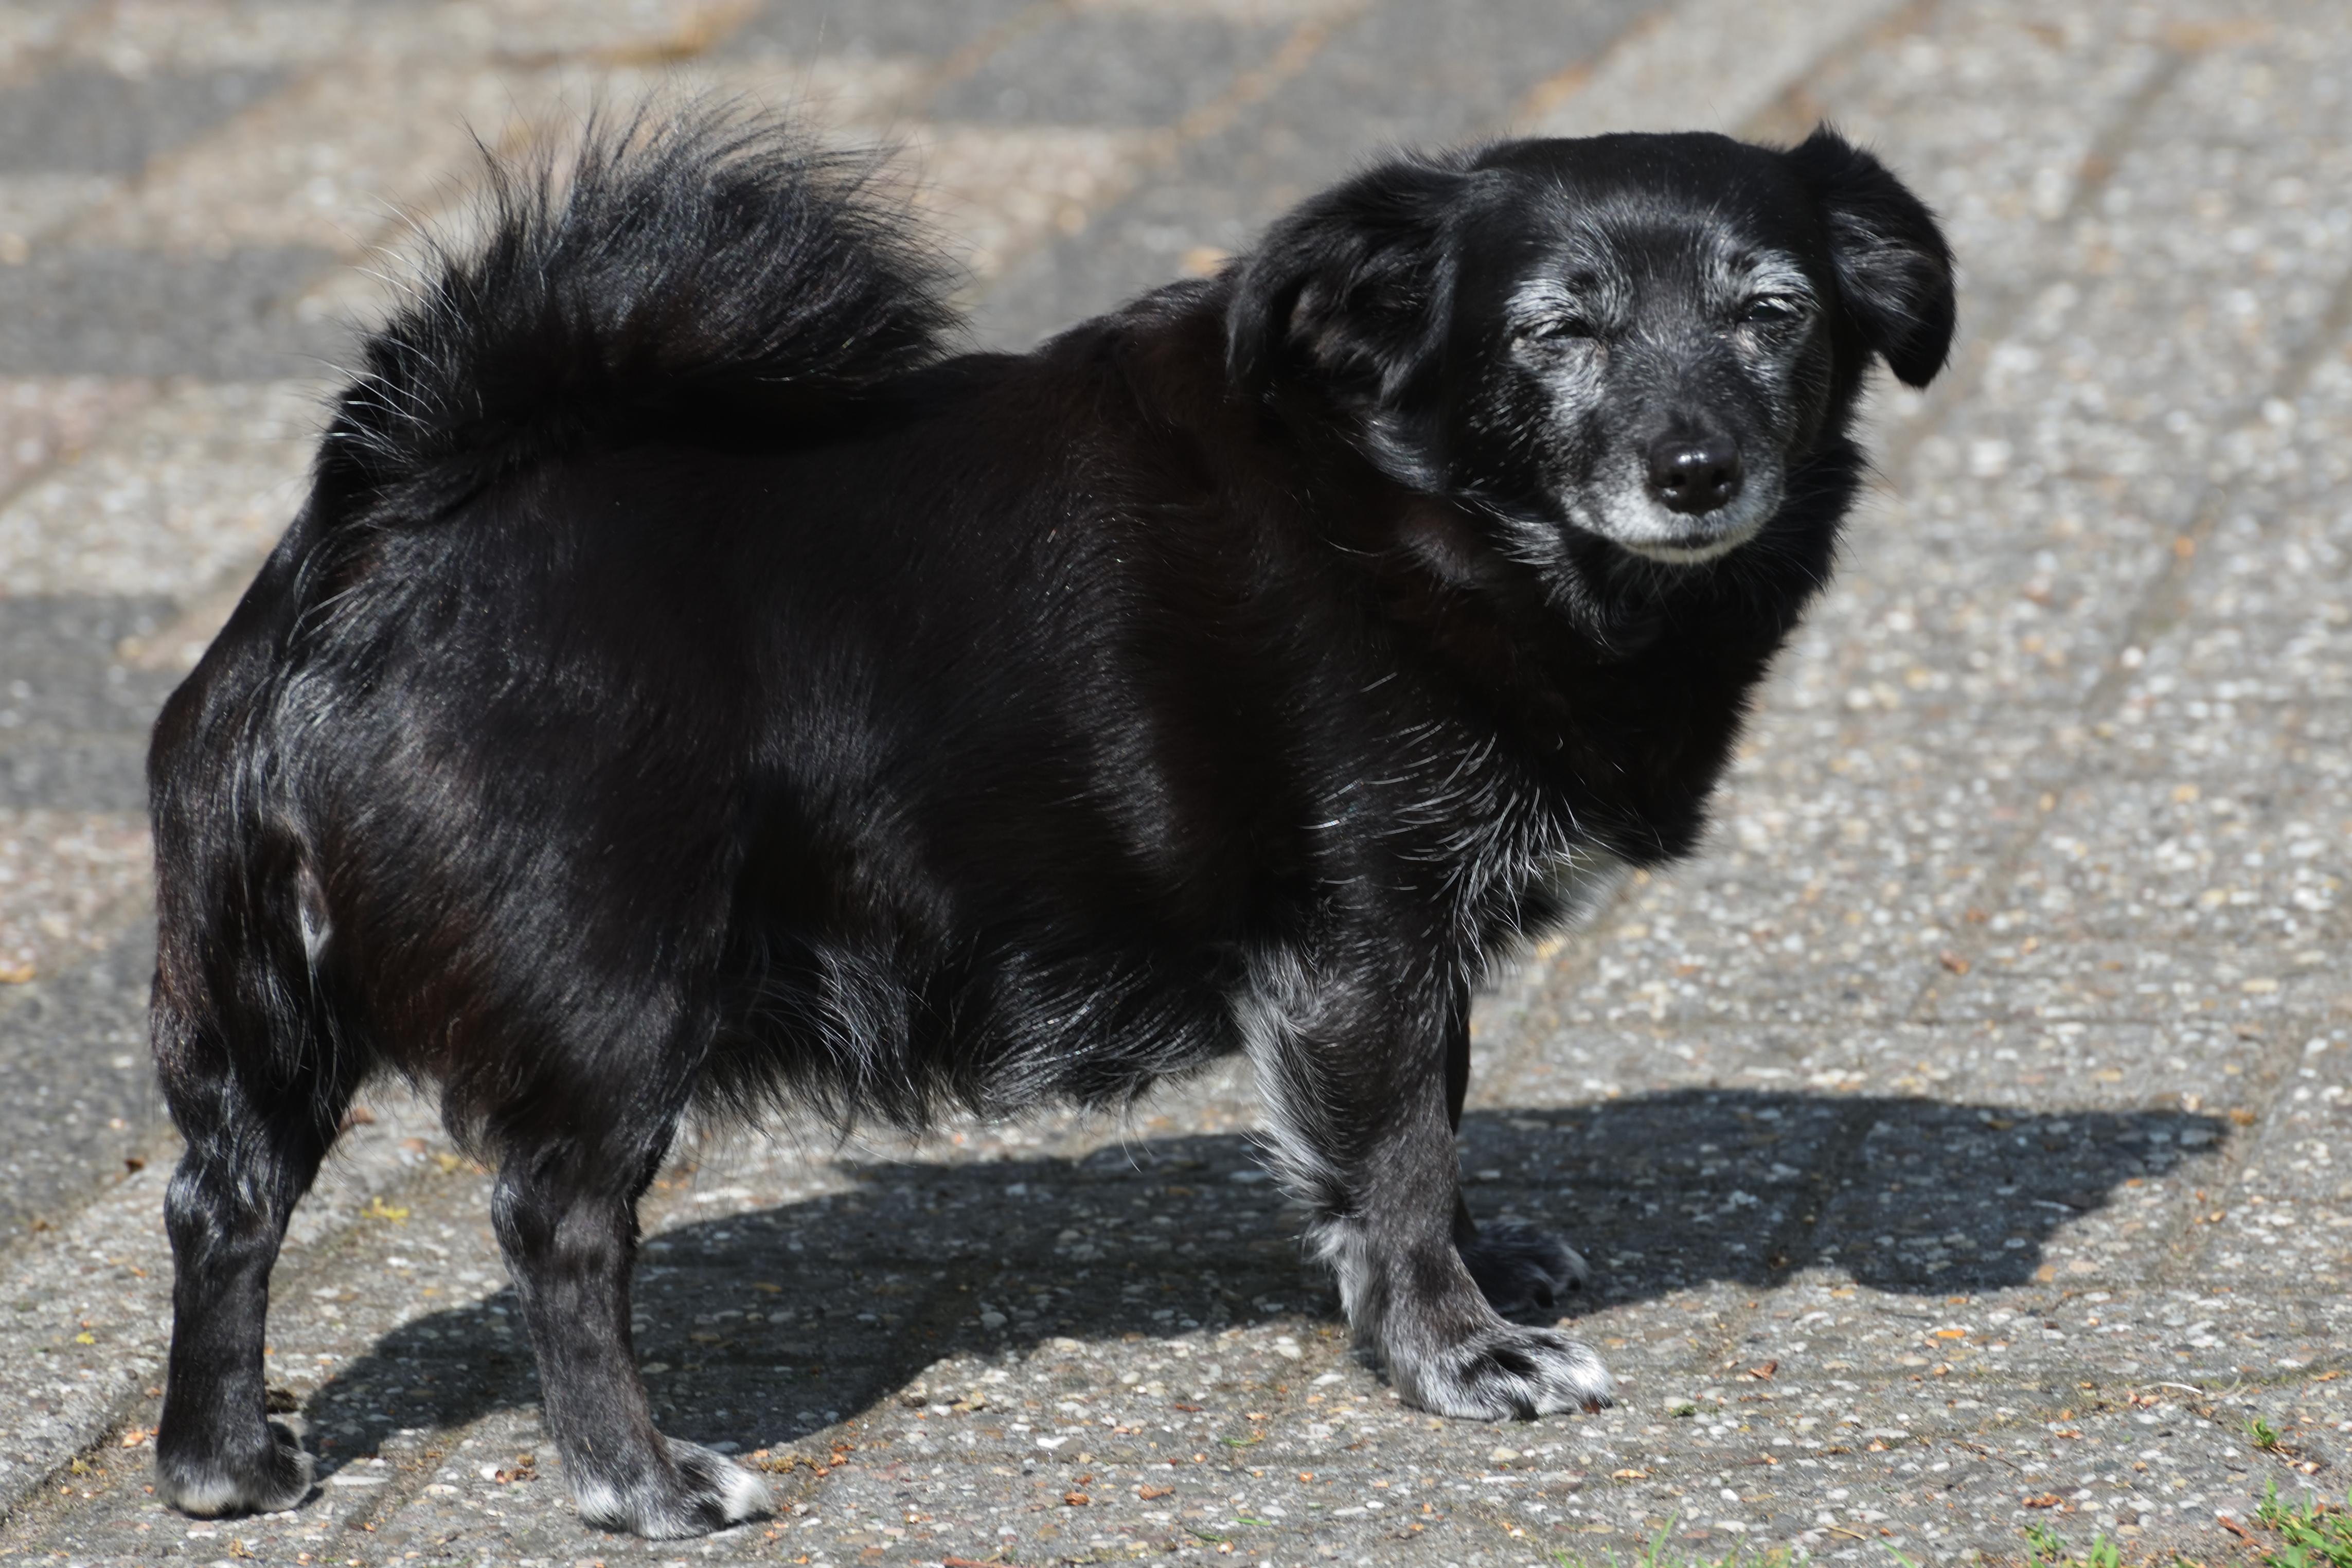 Malou ons hondje